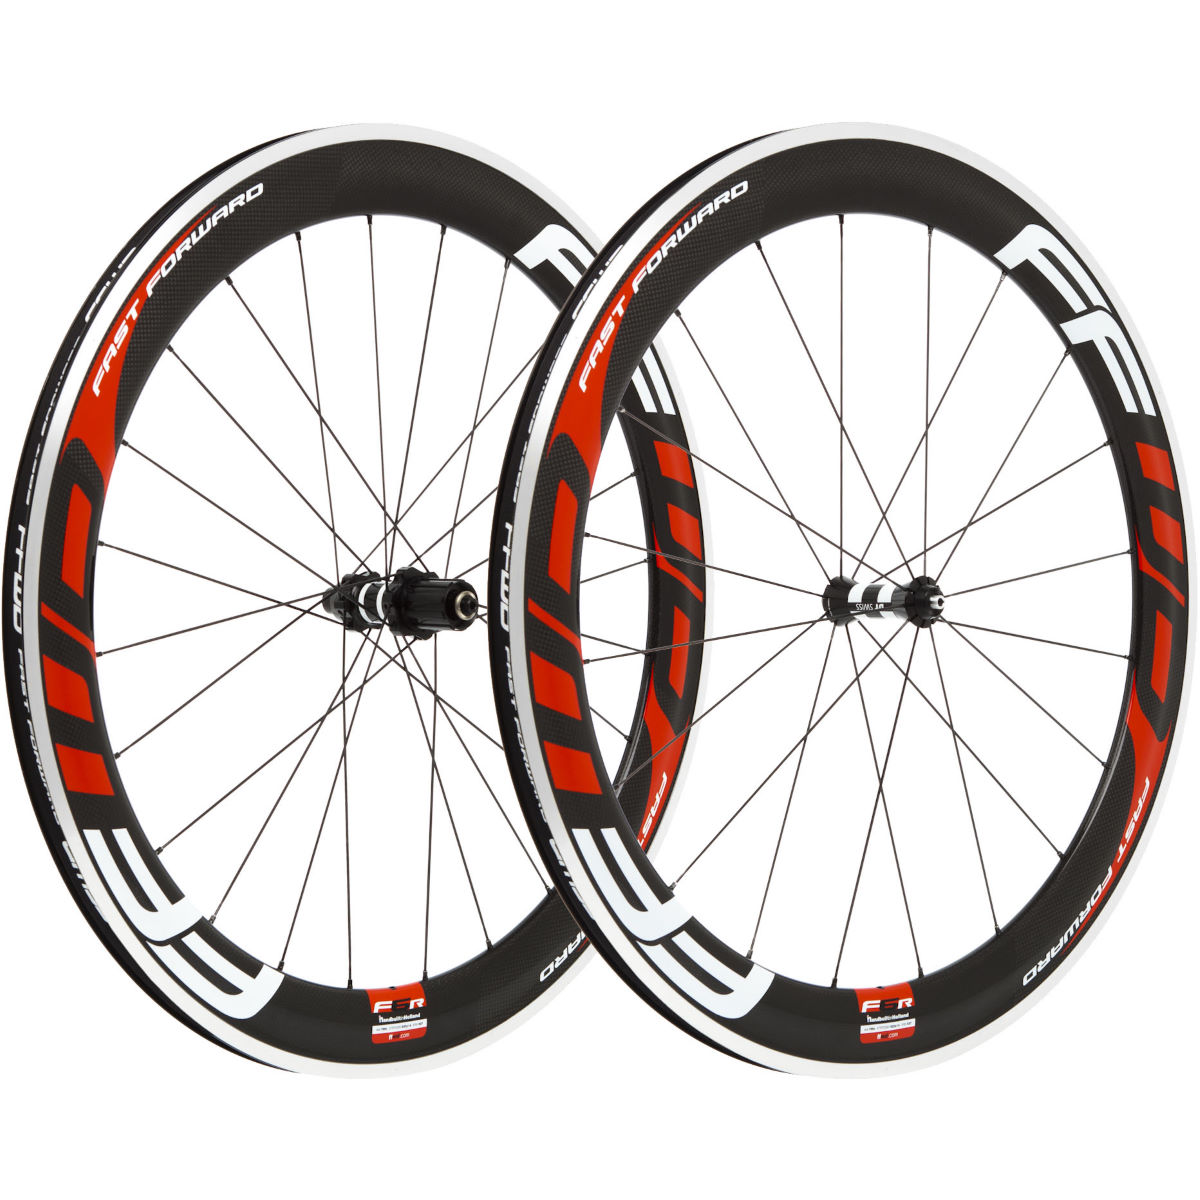 Fast Forward Carbon F6R Clincher 60mm SP Wheelset Performance Wheels